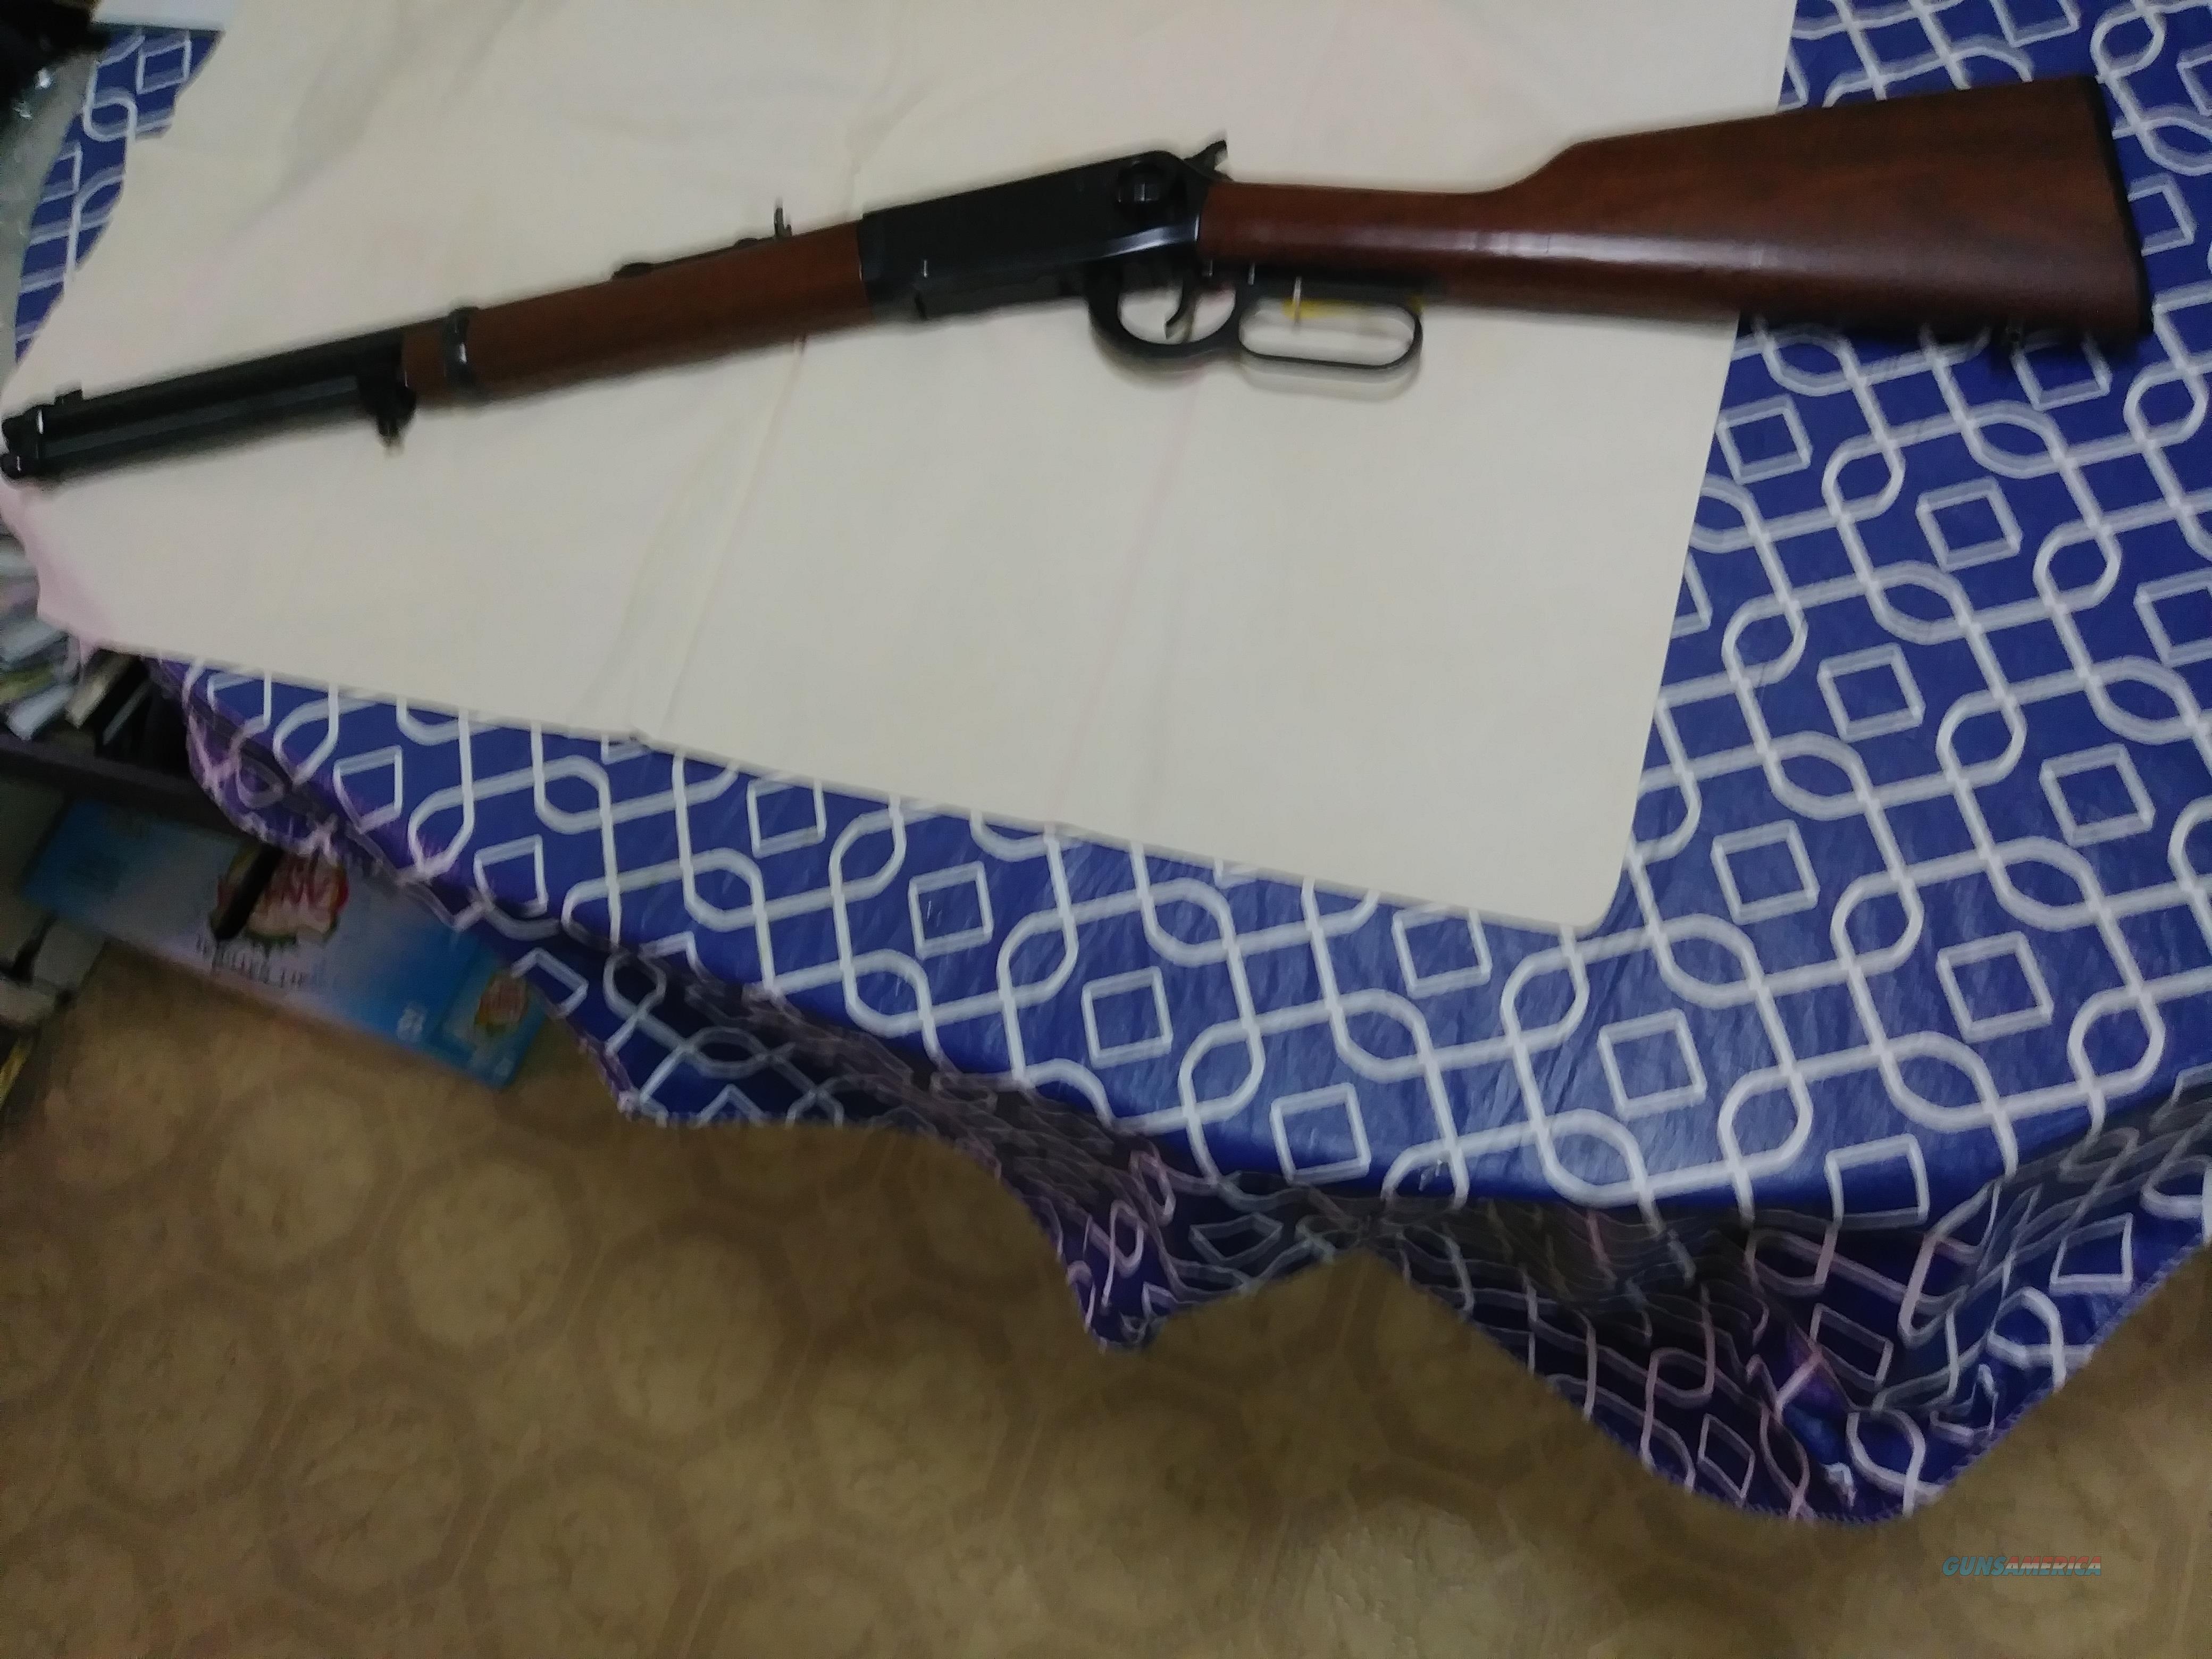 Winchester carbine 44 mag 94 AE  Guns > Rifles > Winchester Rifles - Modern Lever > Model 94 > Post-64